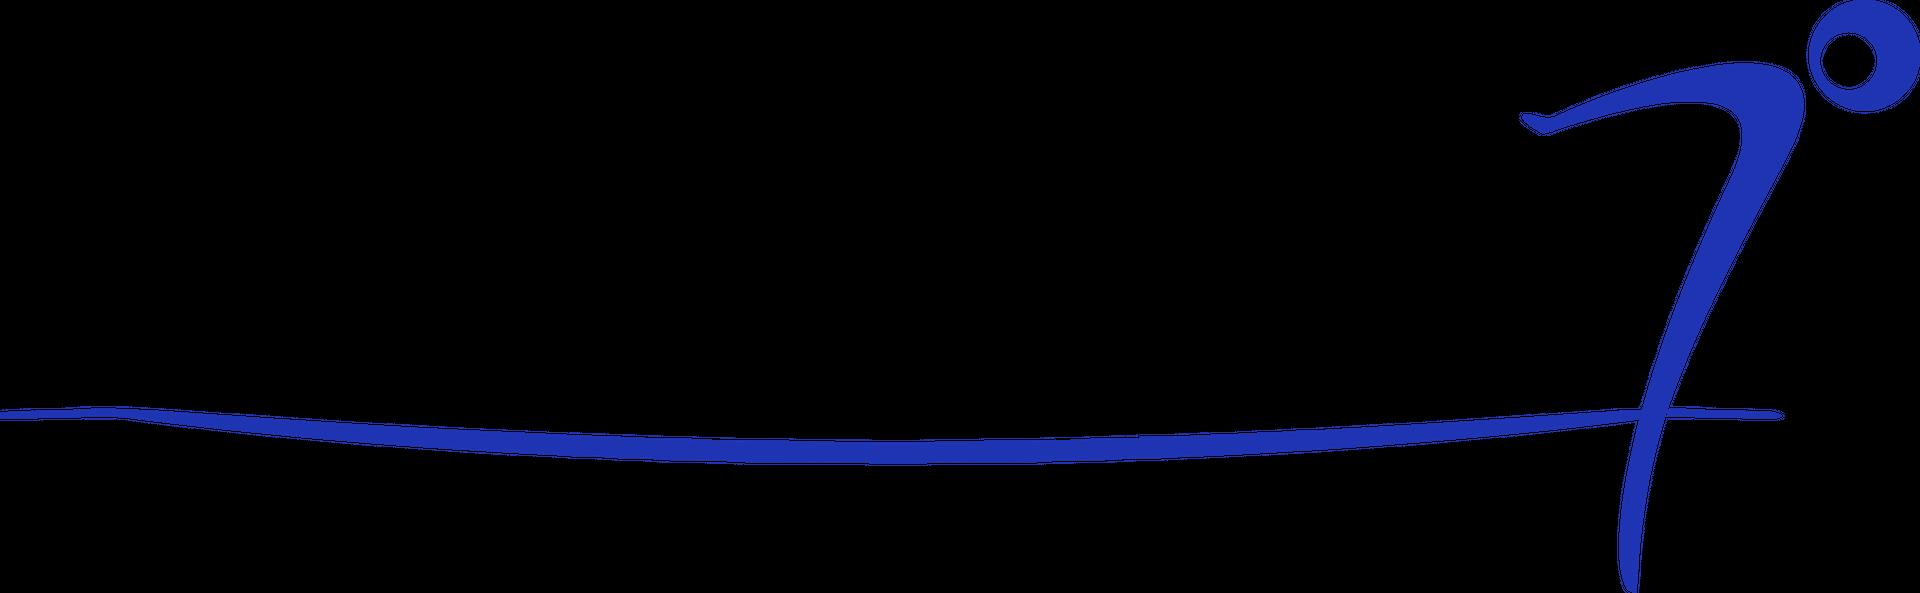 Swimsanity logo featuring a little man